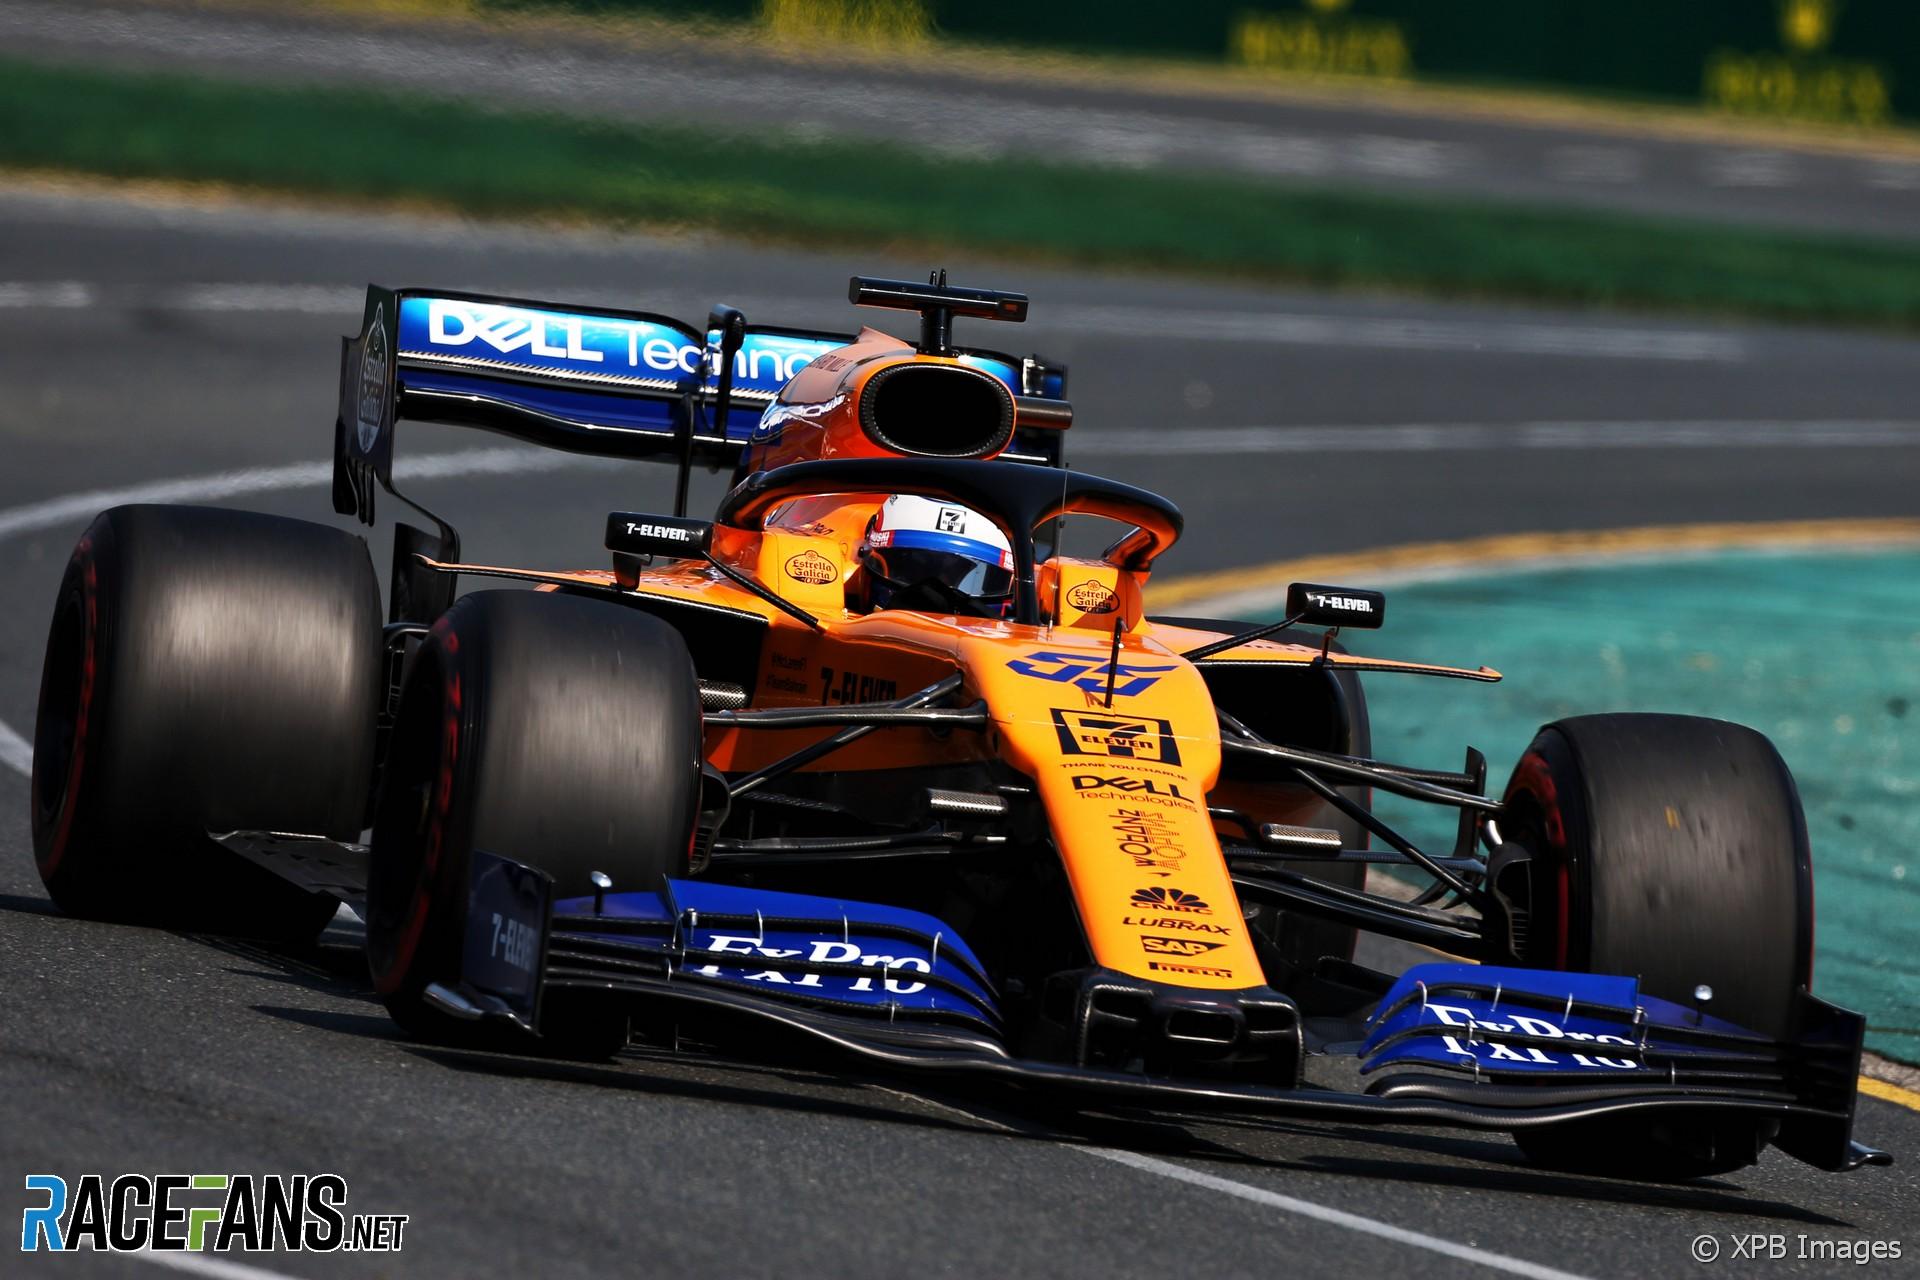 Carlos Sainz Jnr, McLaren, Albert Park, 2019